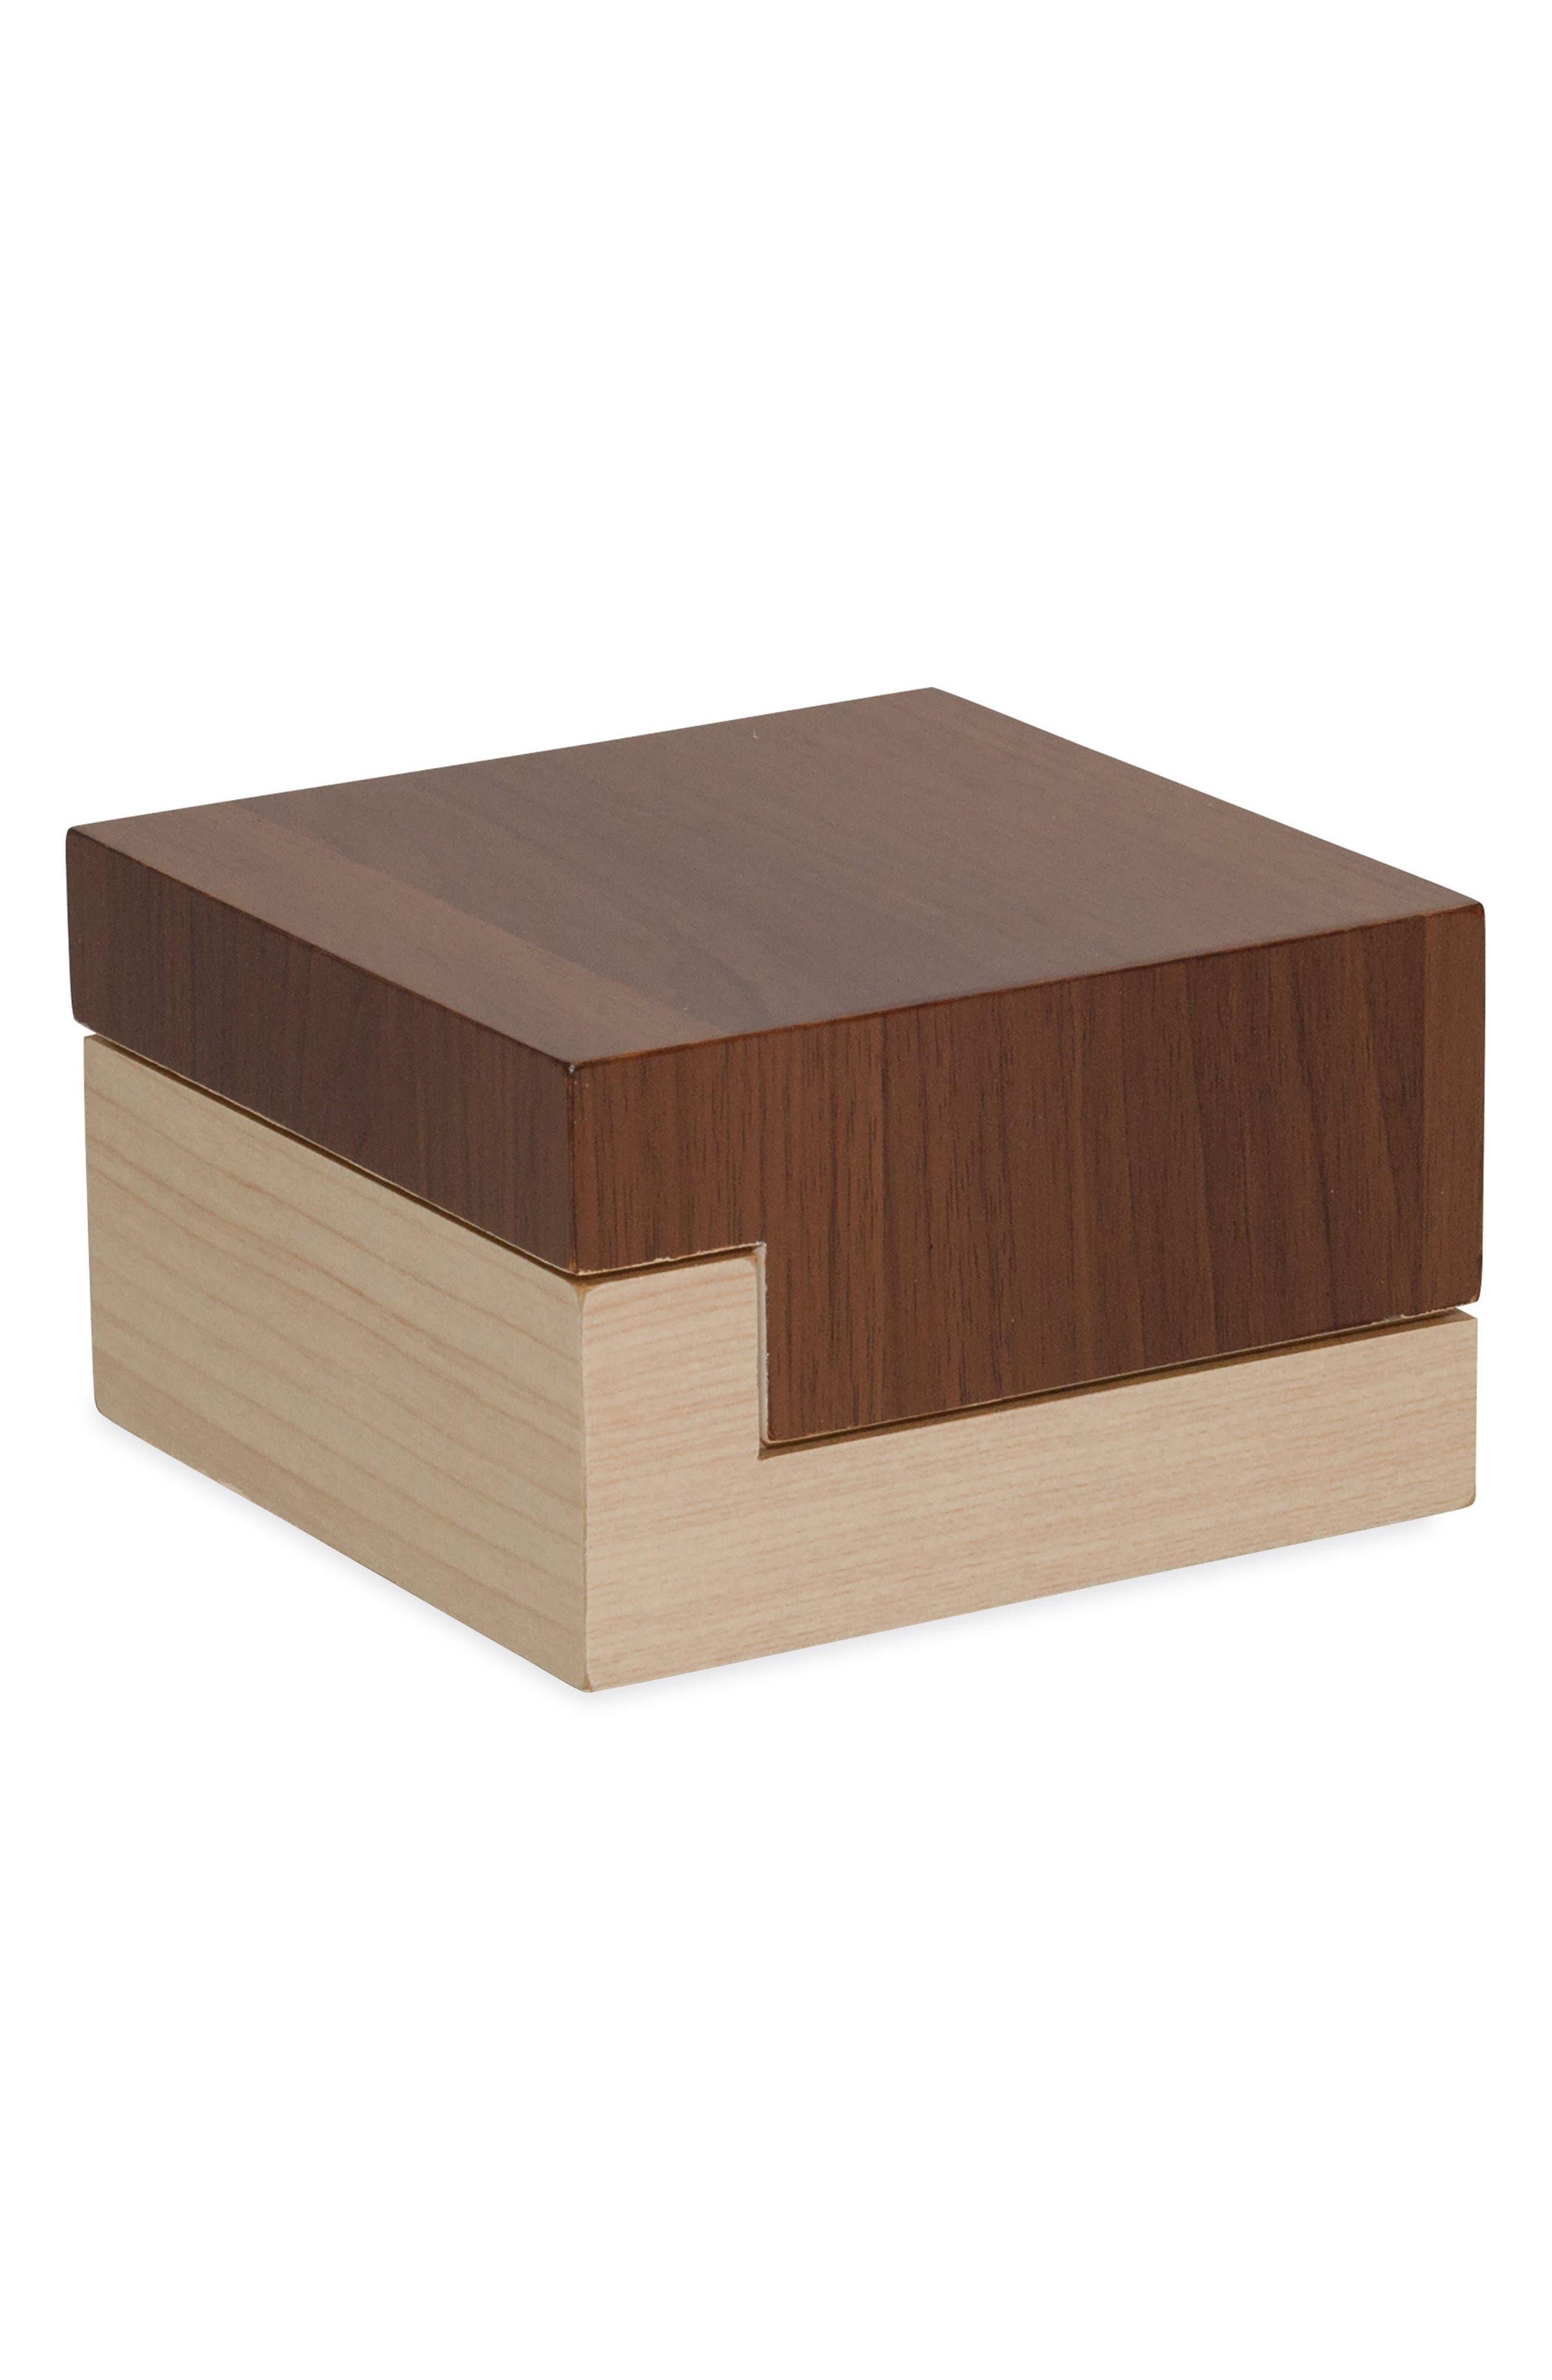 Main Image - DKNY Wood Block Covered Jar